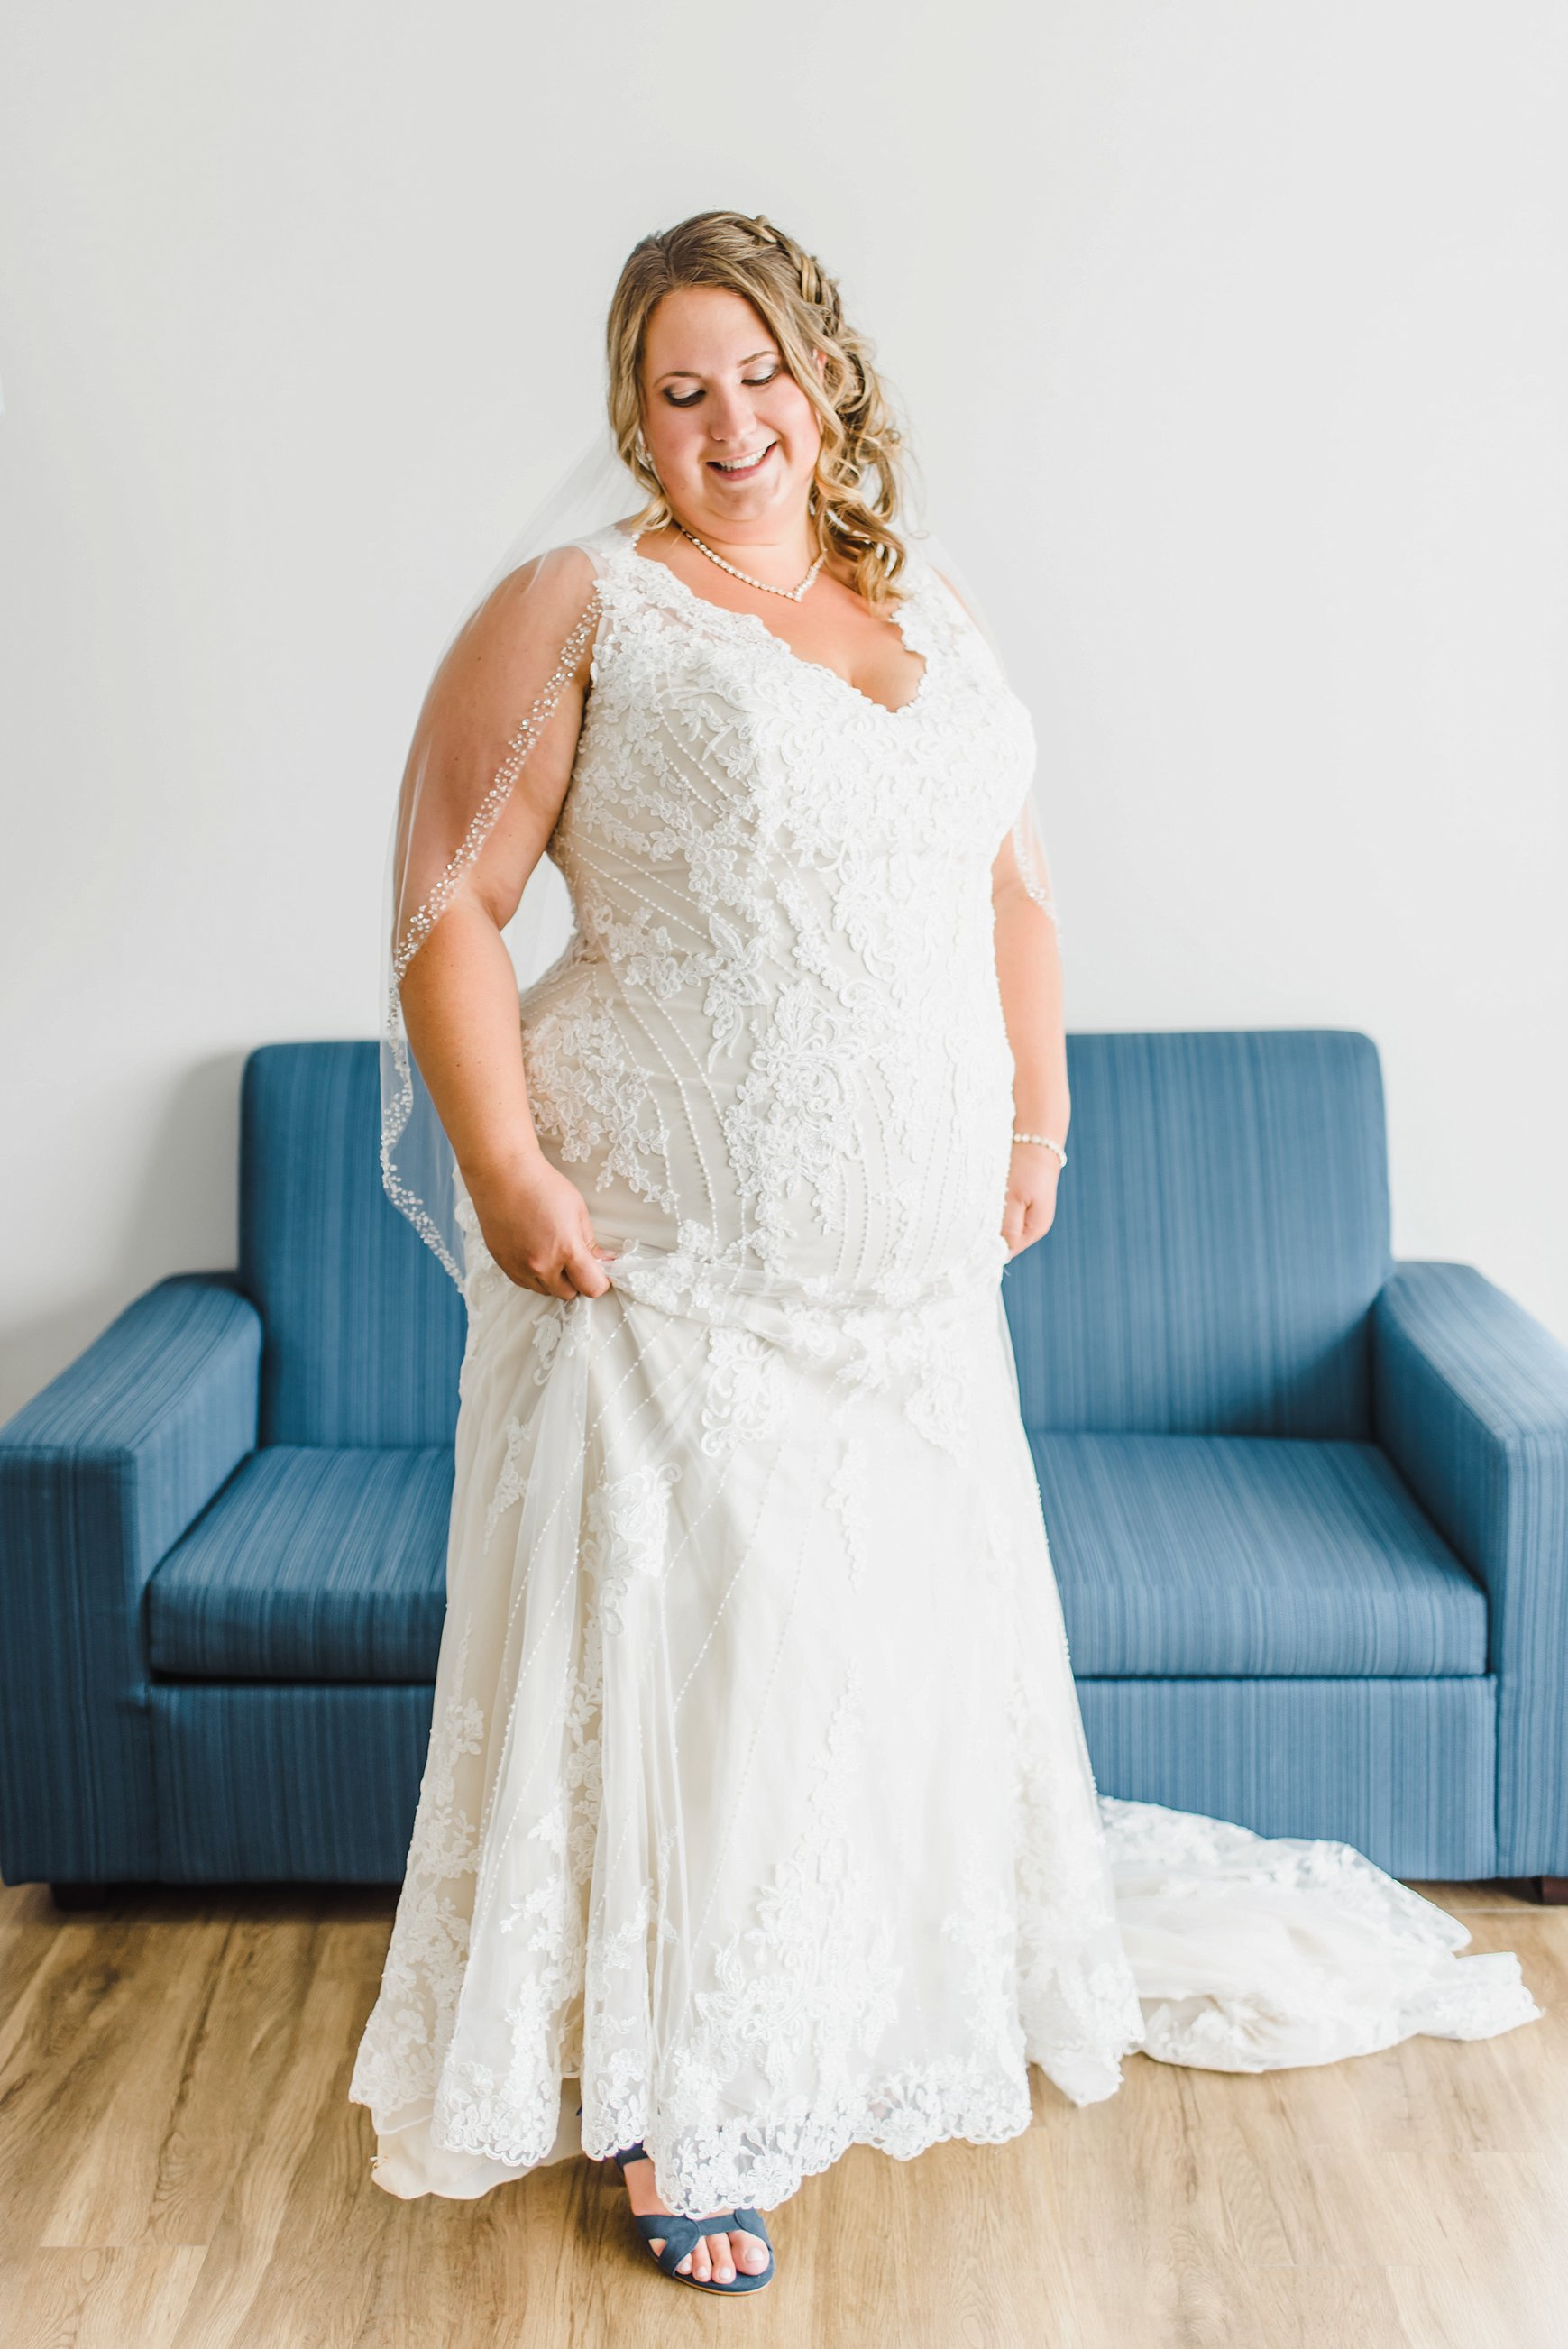 light airy indie fine art ottawa wedding photographer | Ali and Batoul Photography_0347.jpg